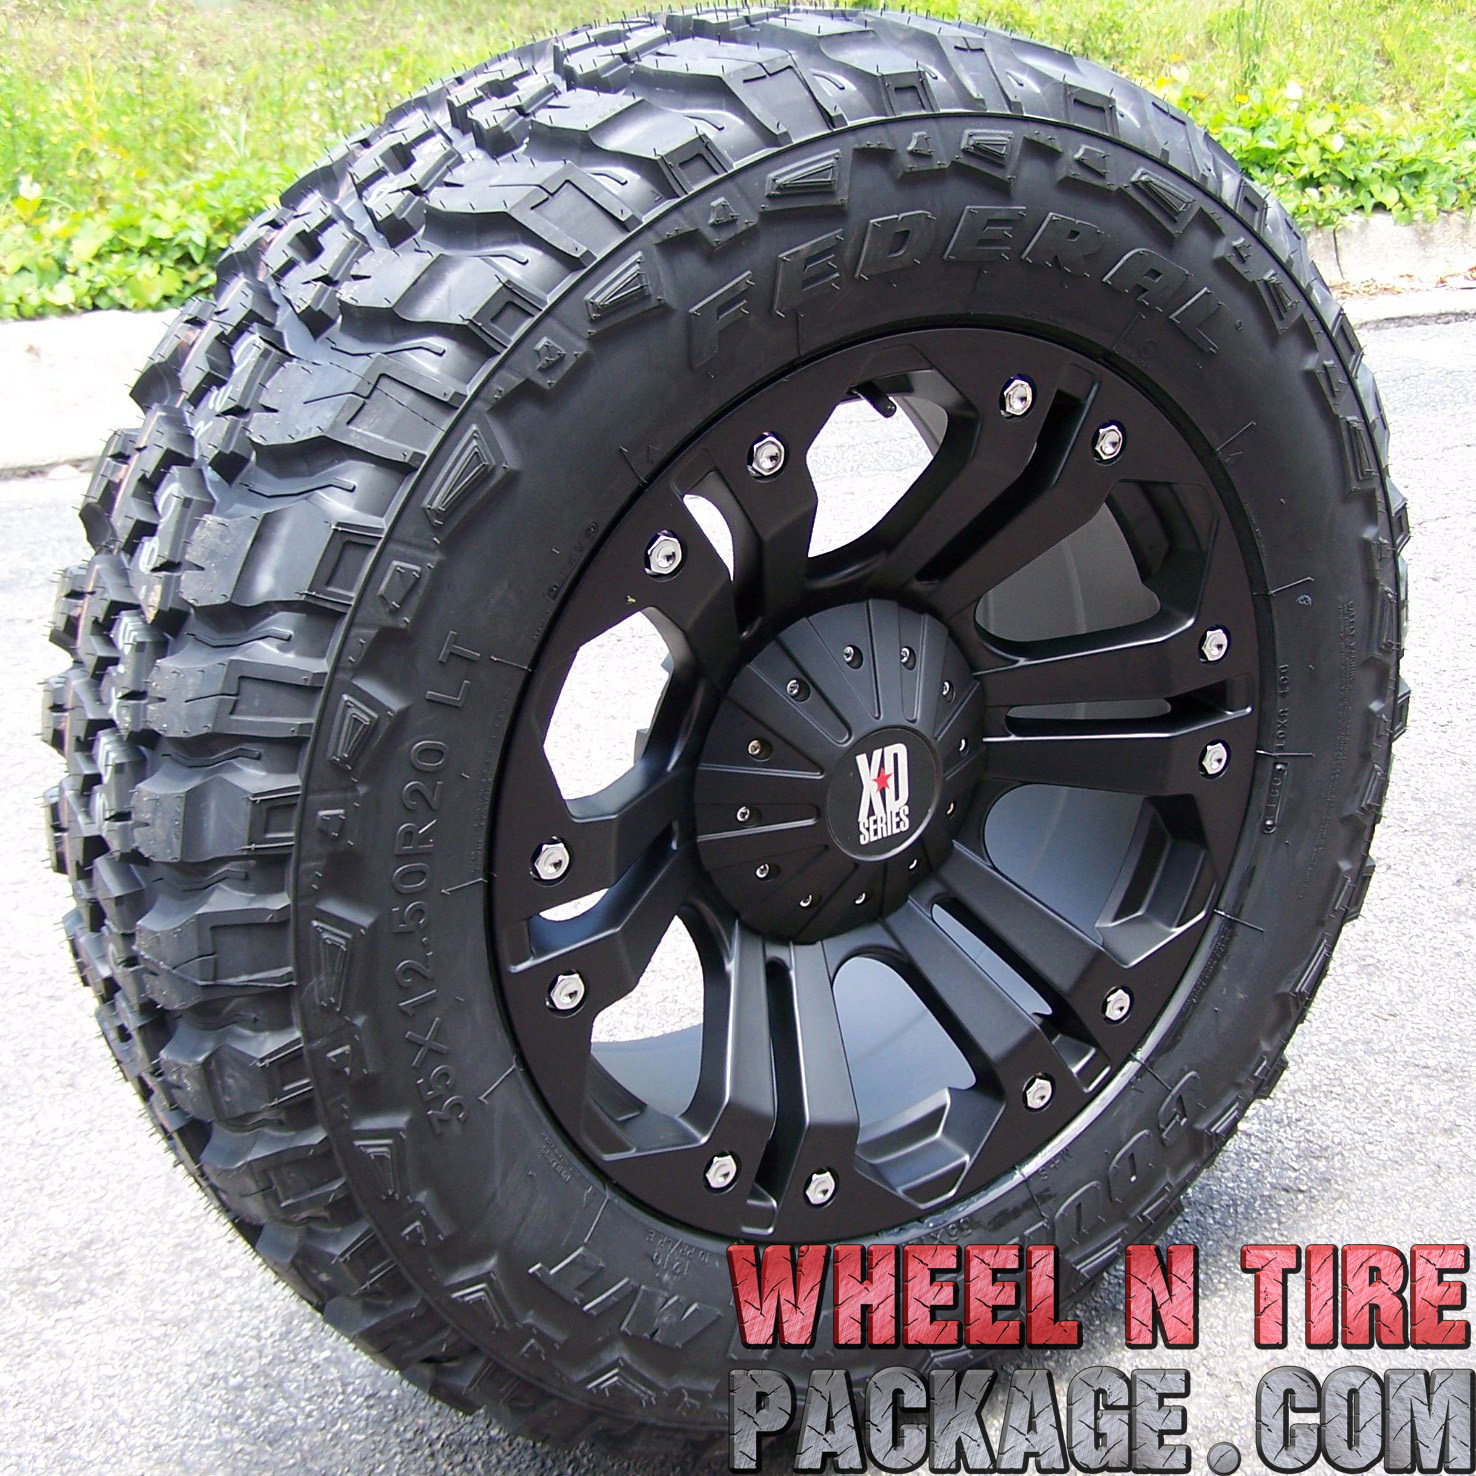 4x4 tyres wheels: